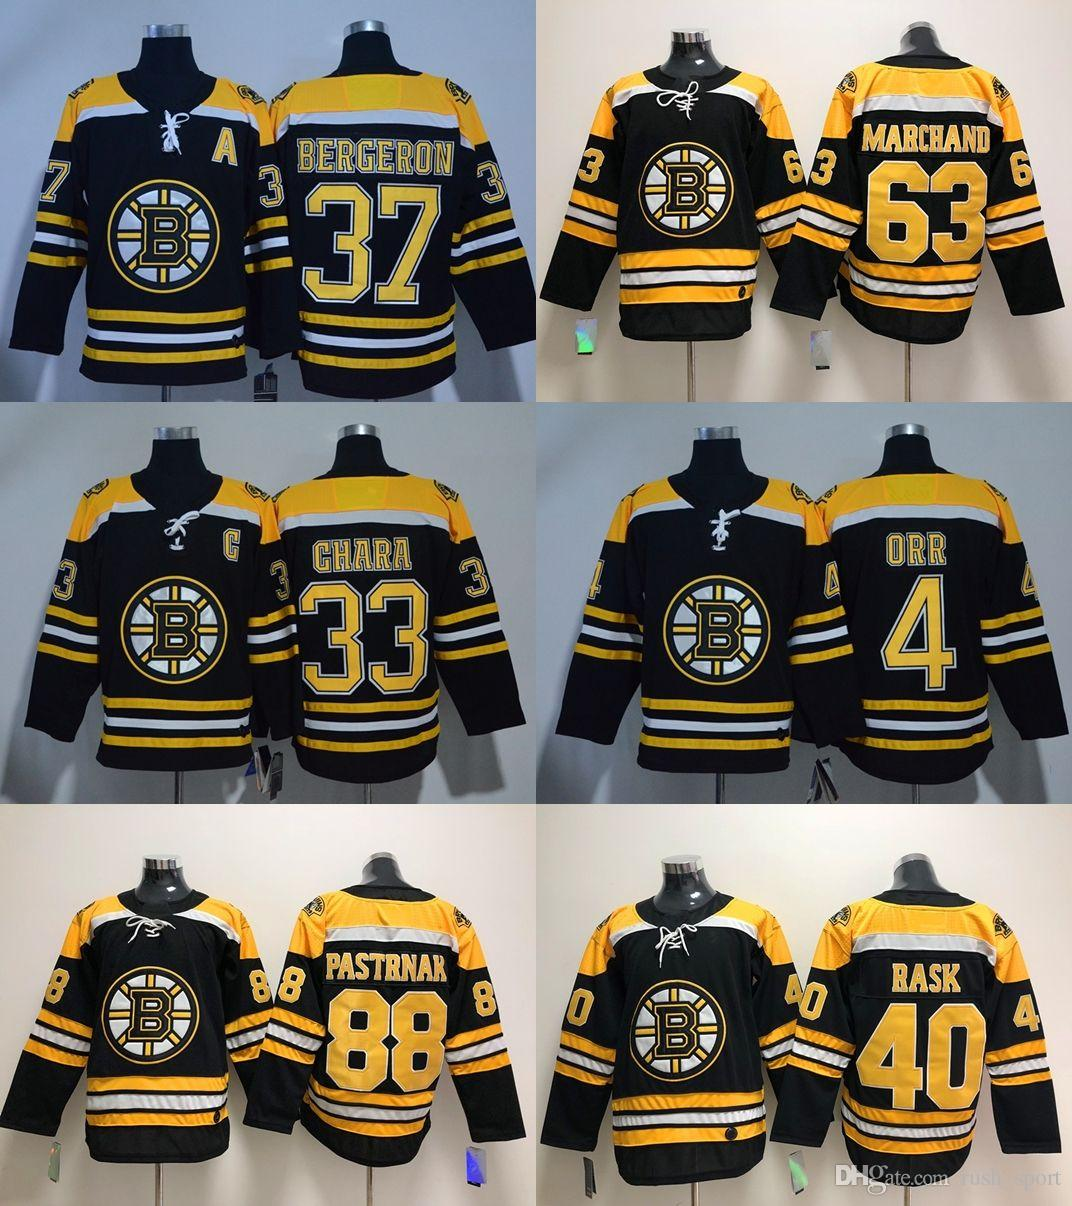 2018 2018 Season Ad Boston Bruins Cheap Hockey Jerseys Bergeron 37 Chara 33  Marchand 63 Orr 4 Rask 40 Bourque 77 Pastrnak 88 Home Black From  Rush sport 4ca33acc1